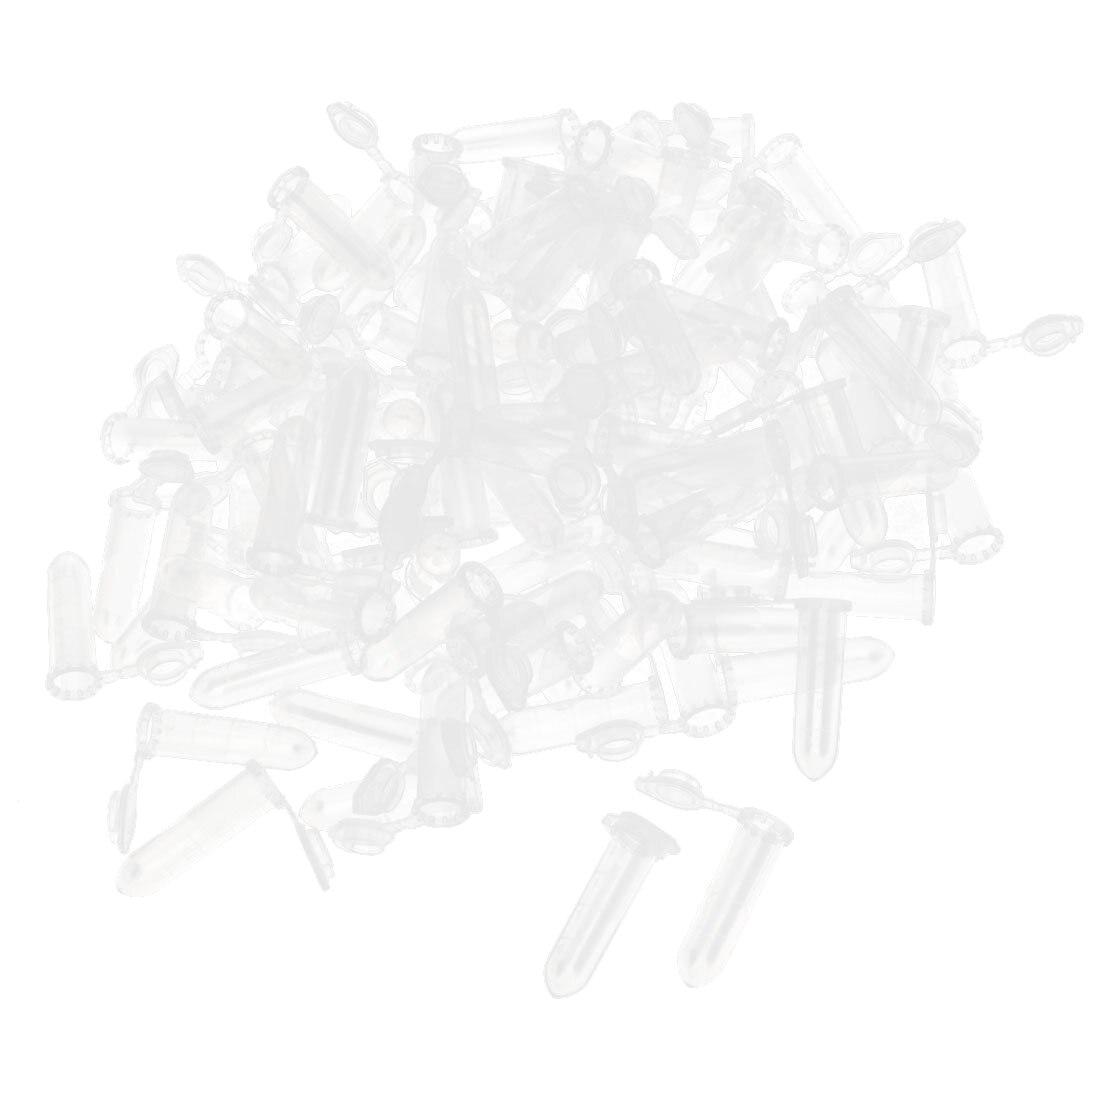 цены  SOSW-Sample Preparation Round Bottom Micro Centrifuge Tubes 2ml 500 Pcs